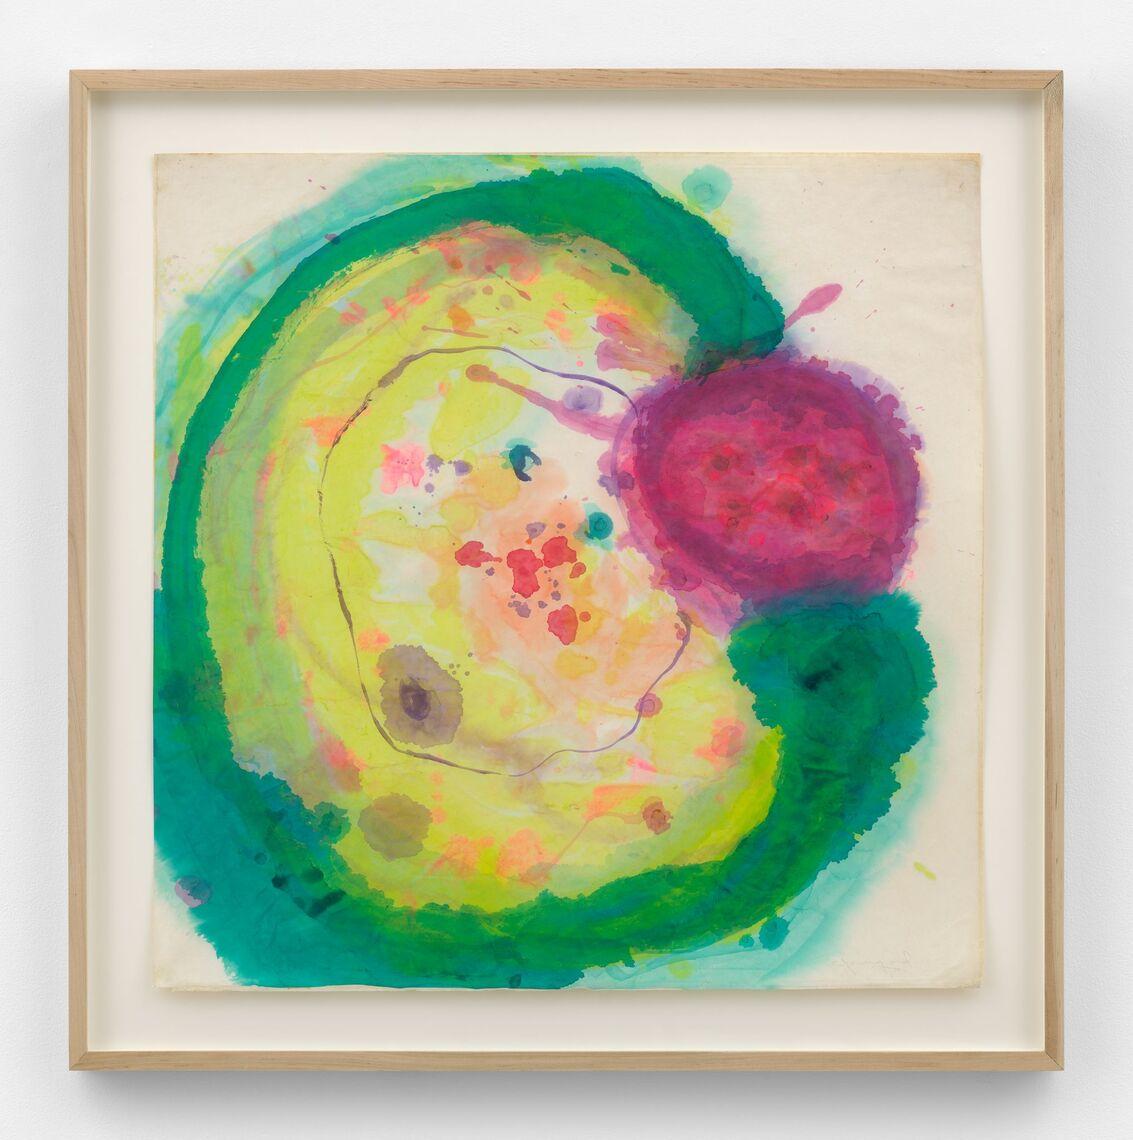 Vivian Springford, Untitled, c. 1968